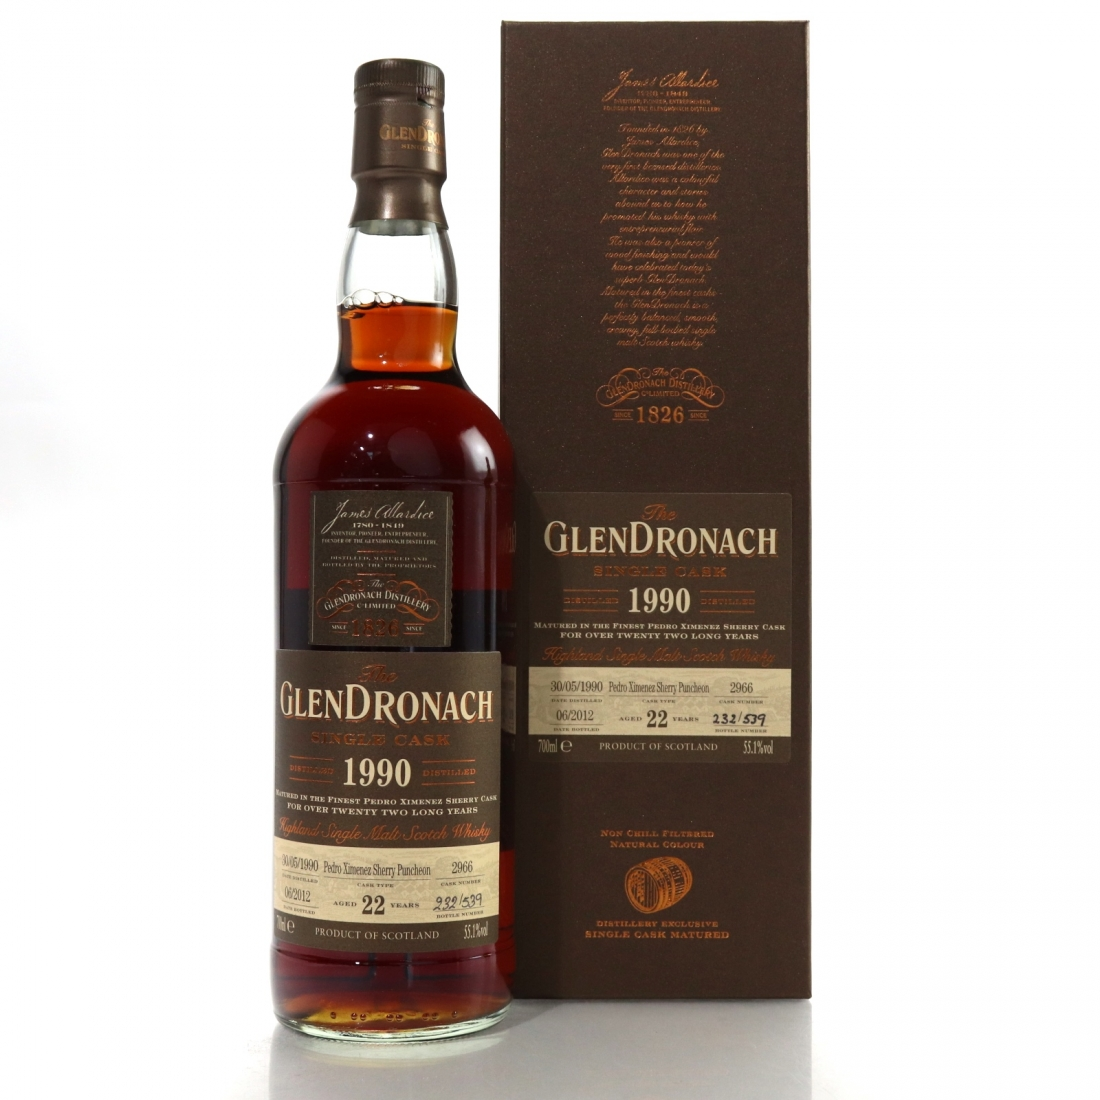 Glendronach 1990 Single Cask 22 Year Old #2966